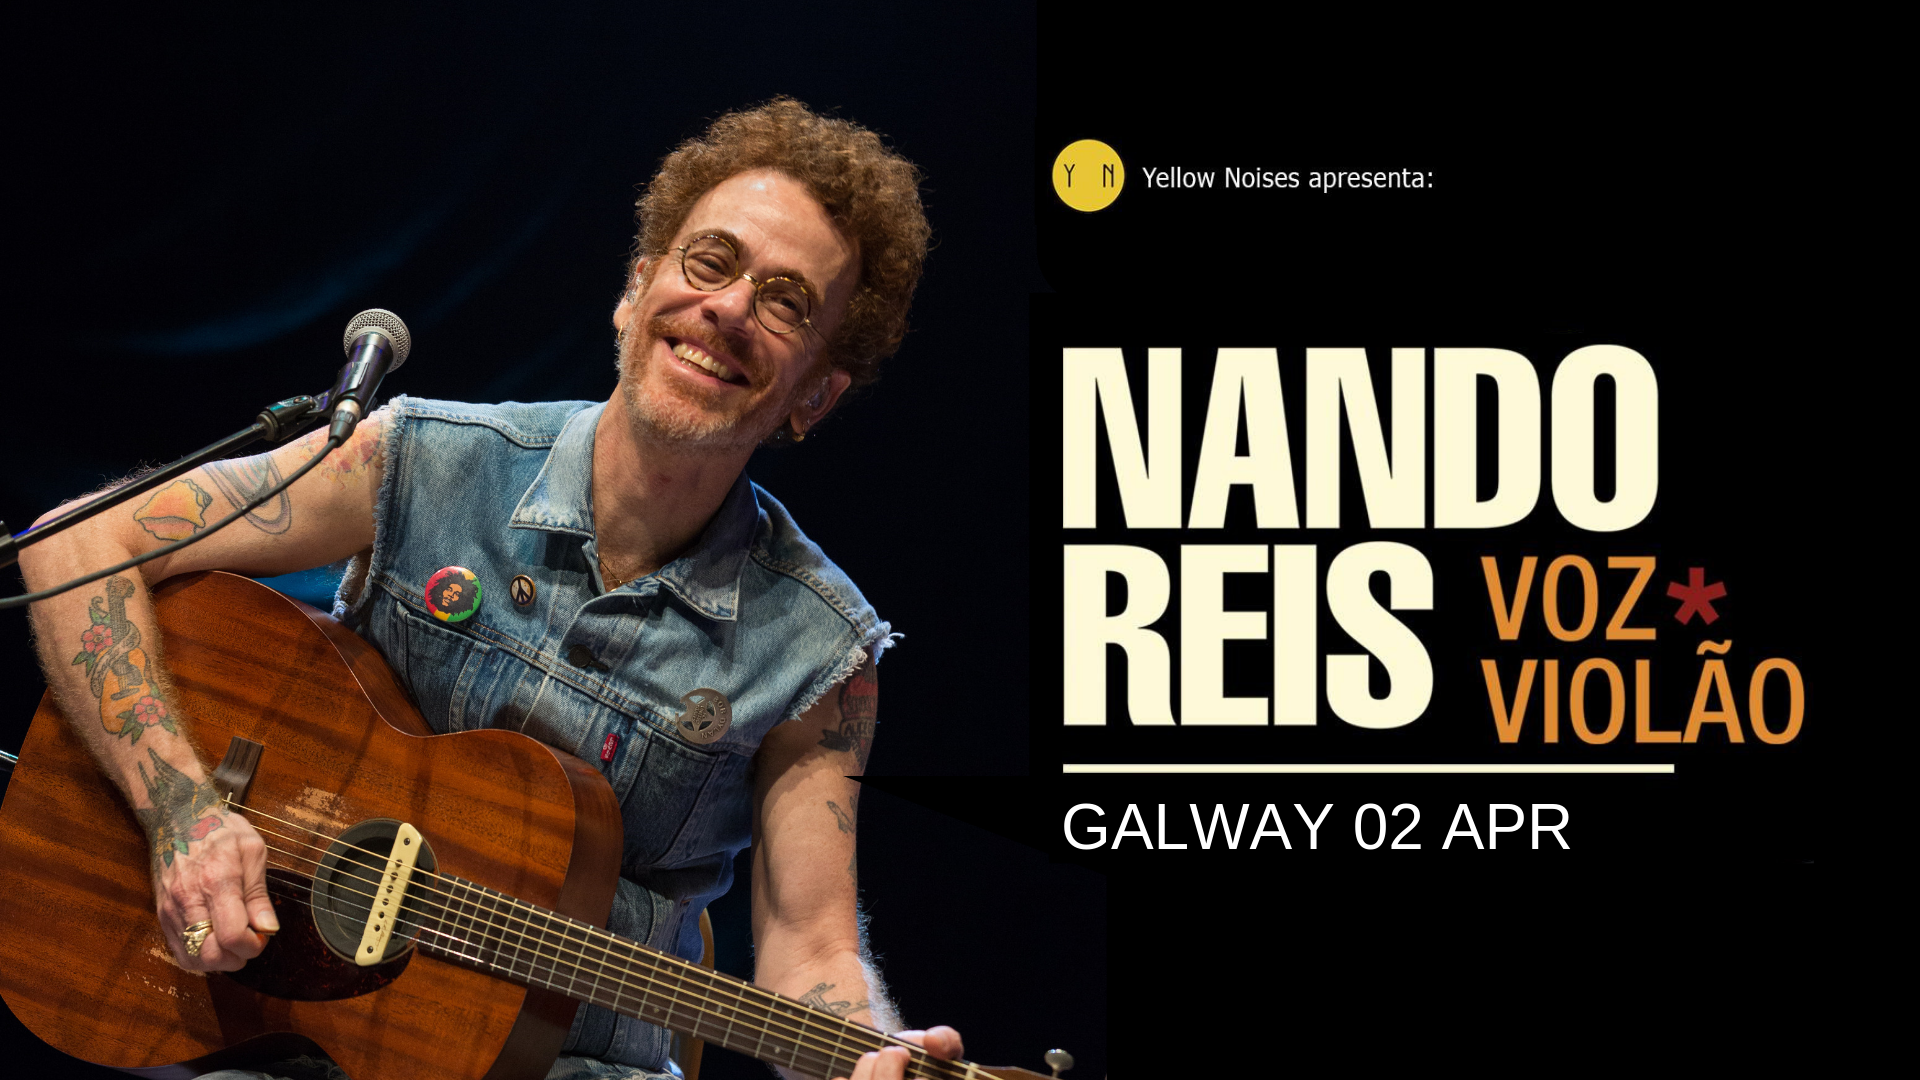 Nando Reis - Galway